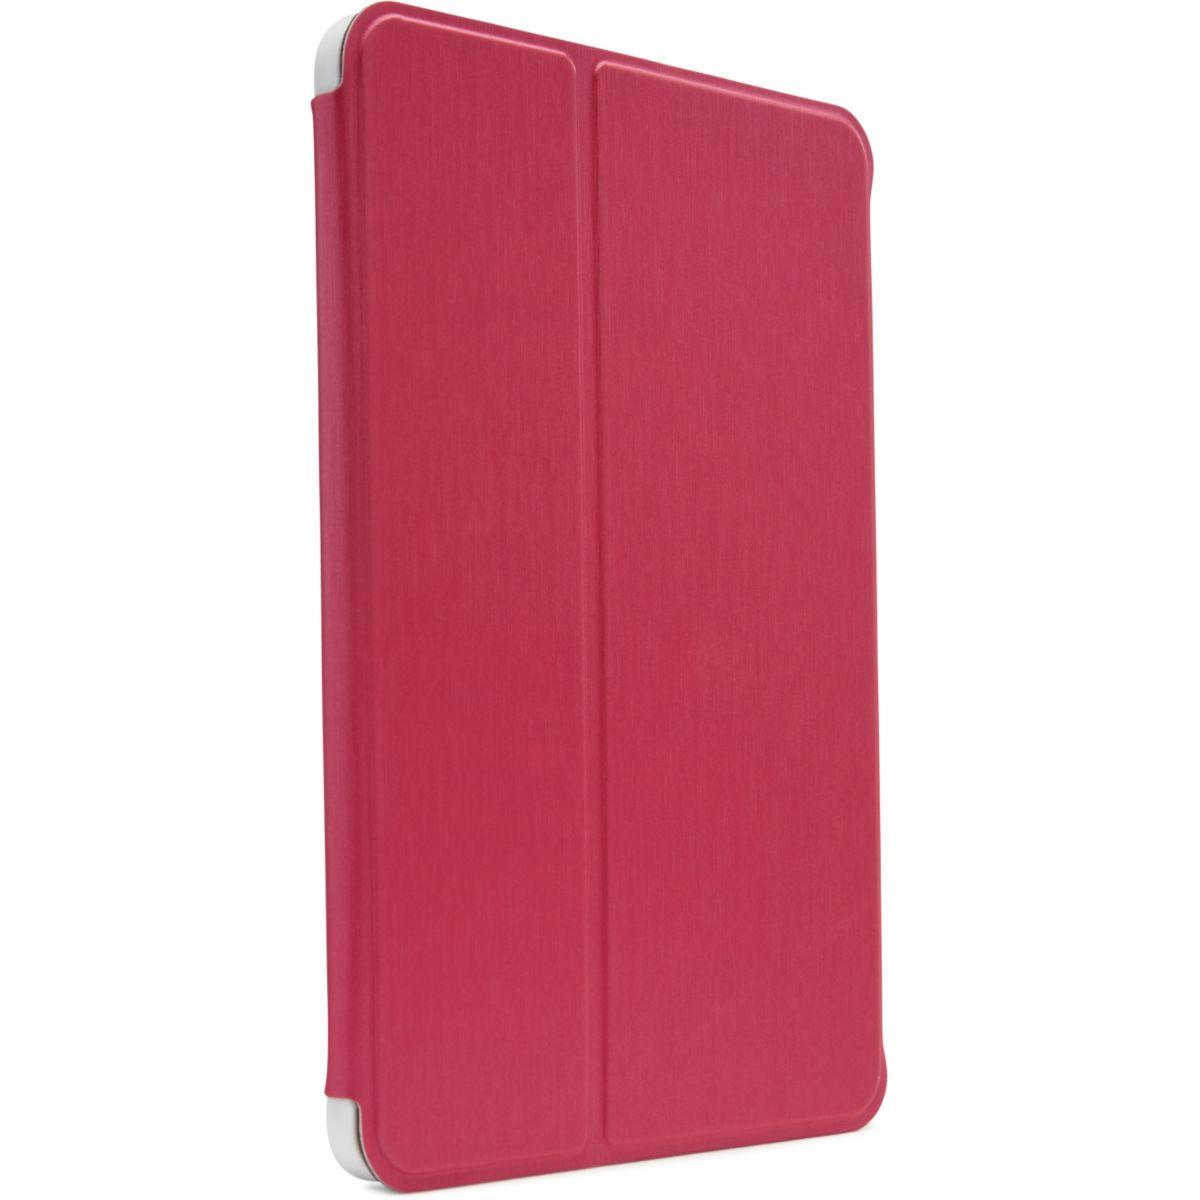 Folio caselogic ipad mini / mini retina rose - 20% de remise immédiate avec le code : multi20 (photo)